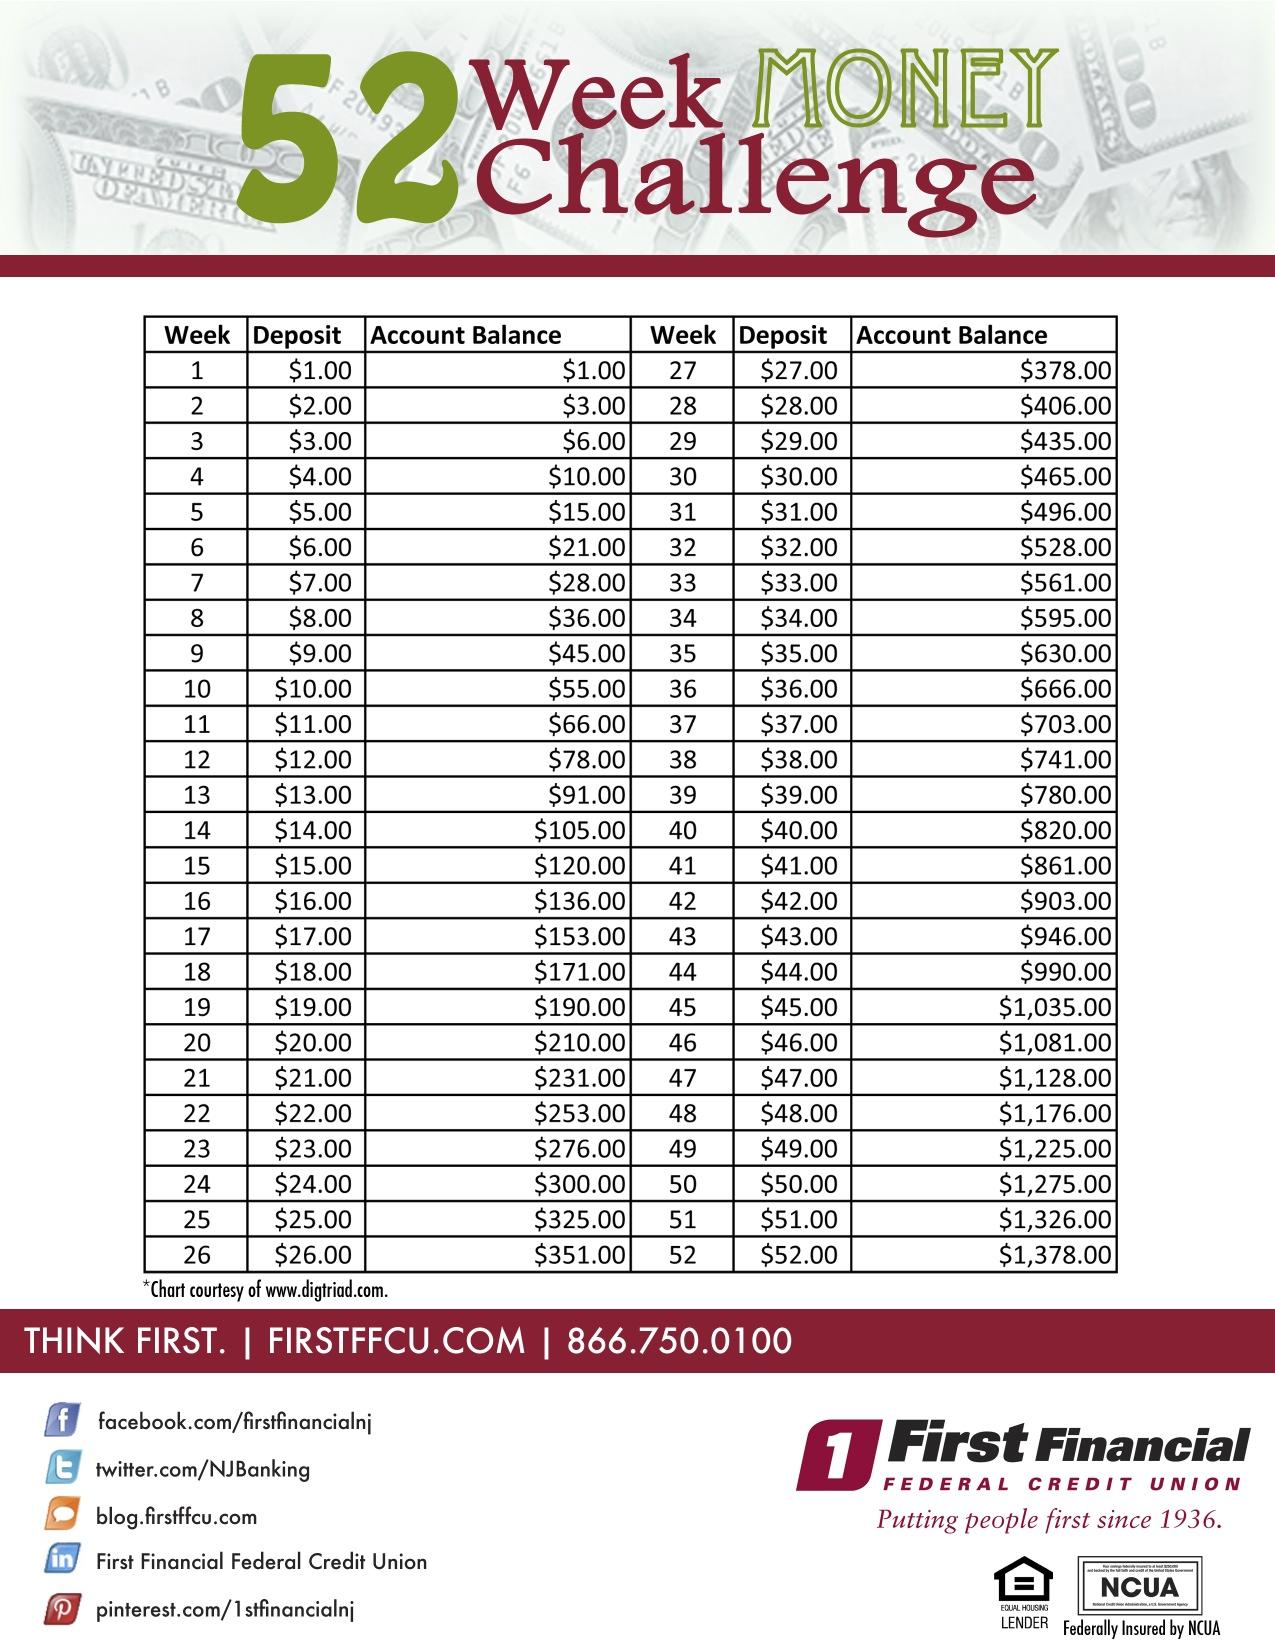 52 Week Money Savings Challenge Take the 52 week money